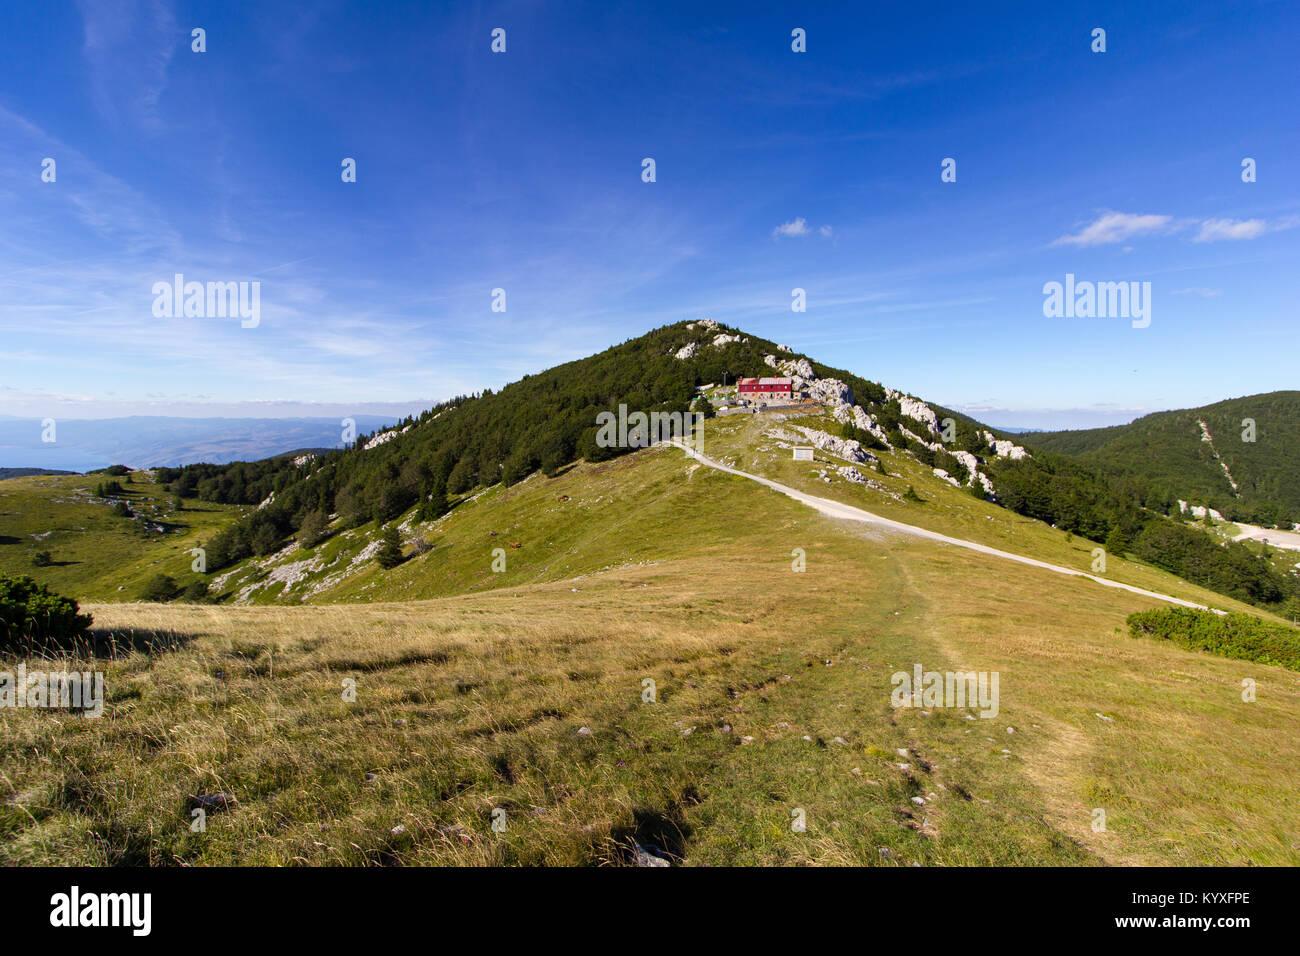 Mountain hut at Zavizan viewed from the nearest peak - Northern Velebit National Park, Croatia -  Aug 2016 Stock Photo